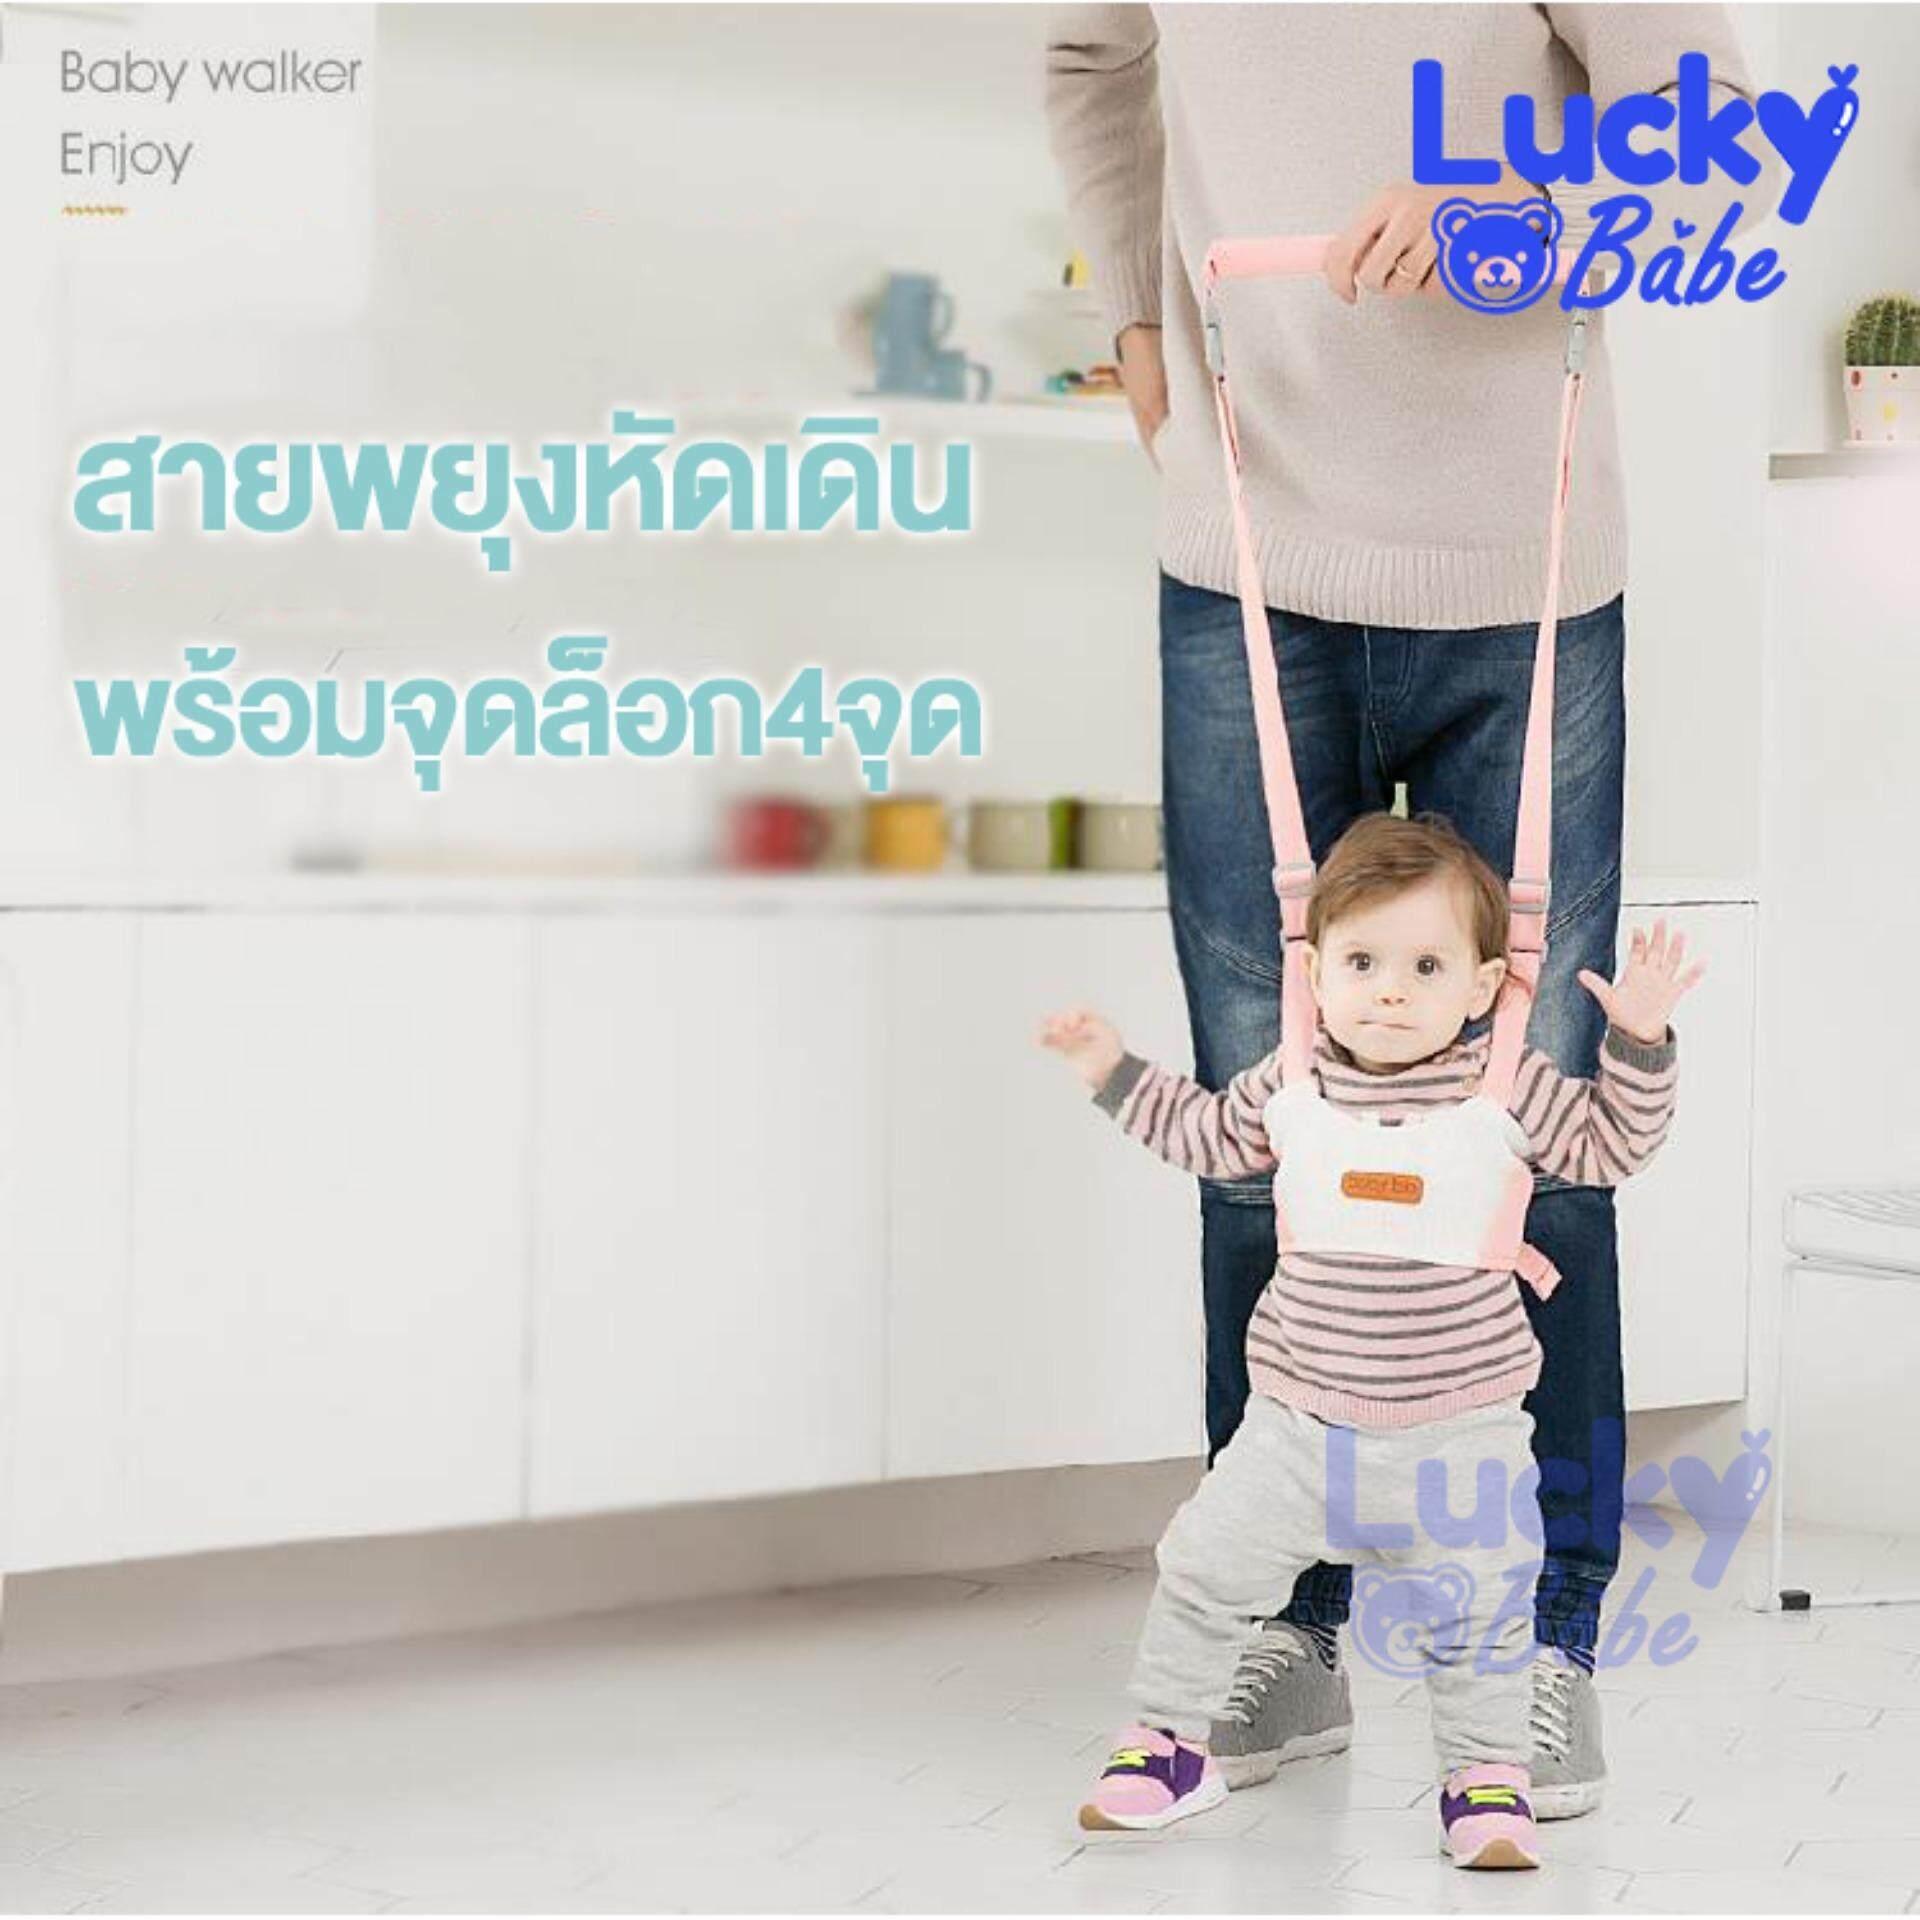 Lucky Team Baby walker อุปกรณ์พยุงเด็กวัยหัดเดิน สายพยุงหัดเดินสำหรับเด็ก BA09